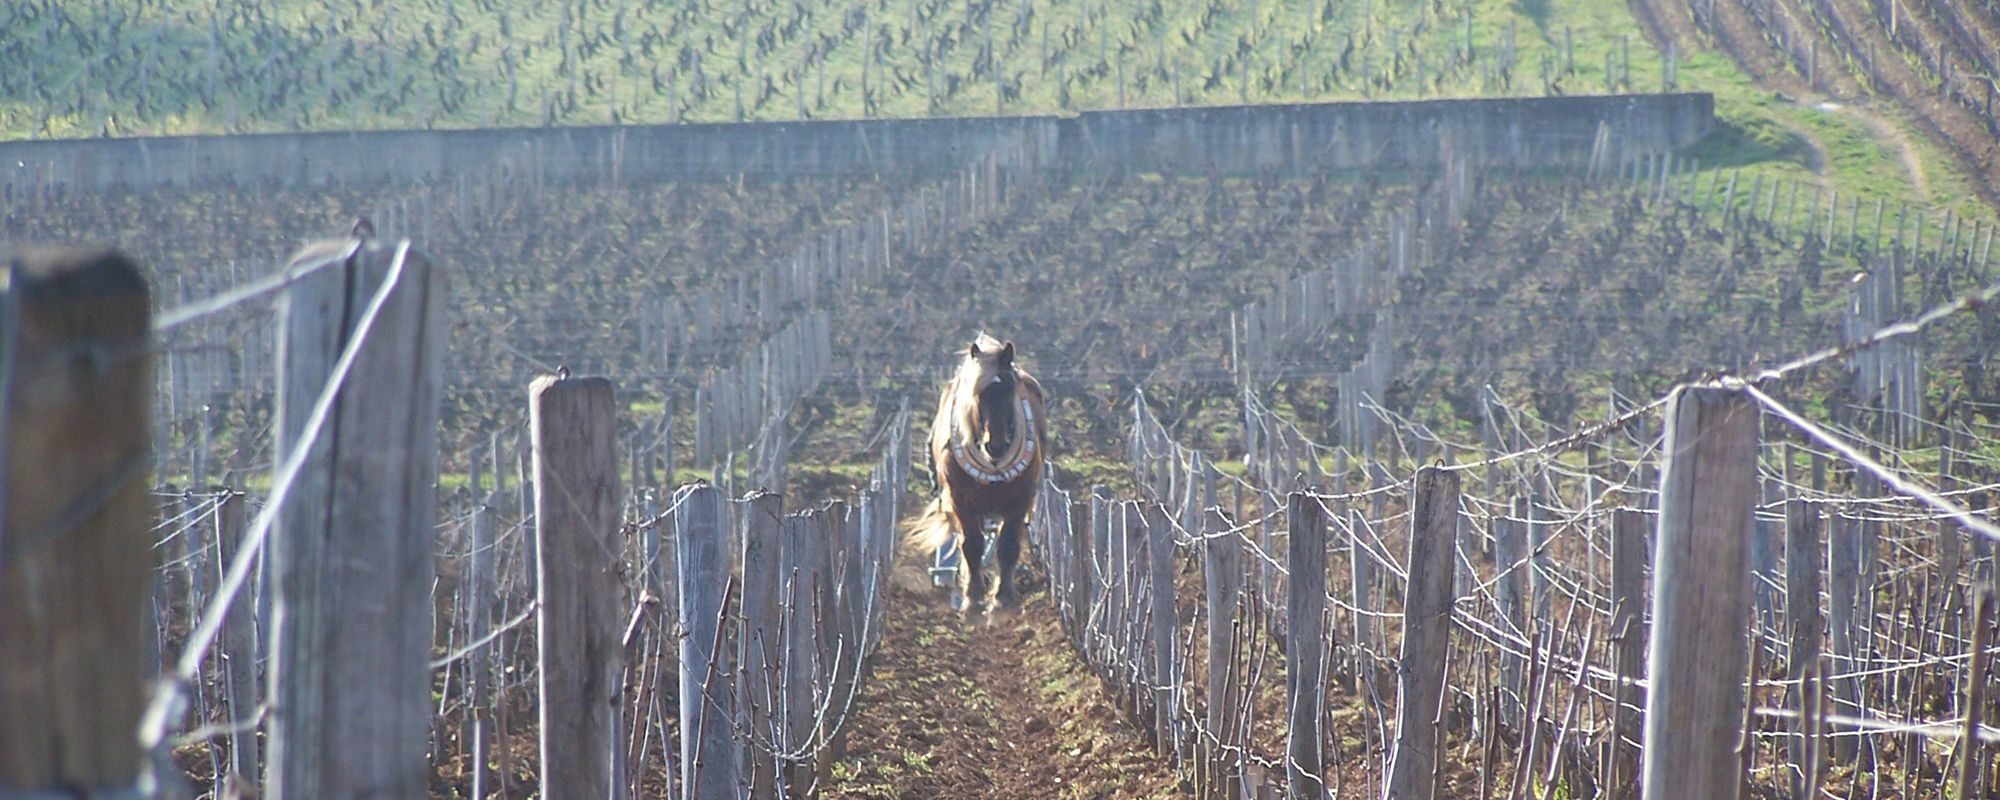 vigne-cheval